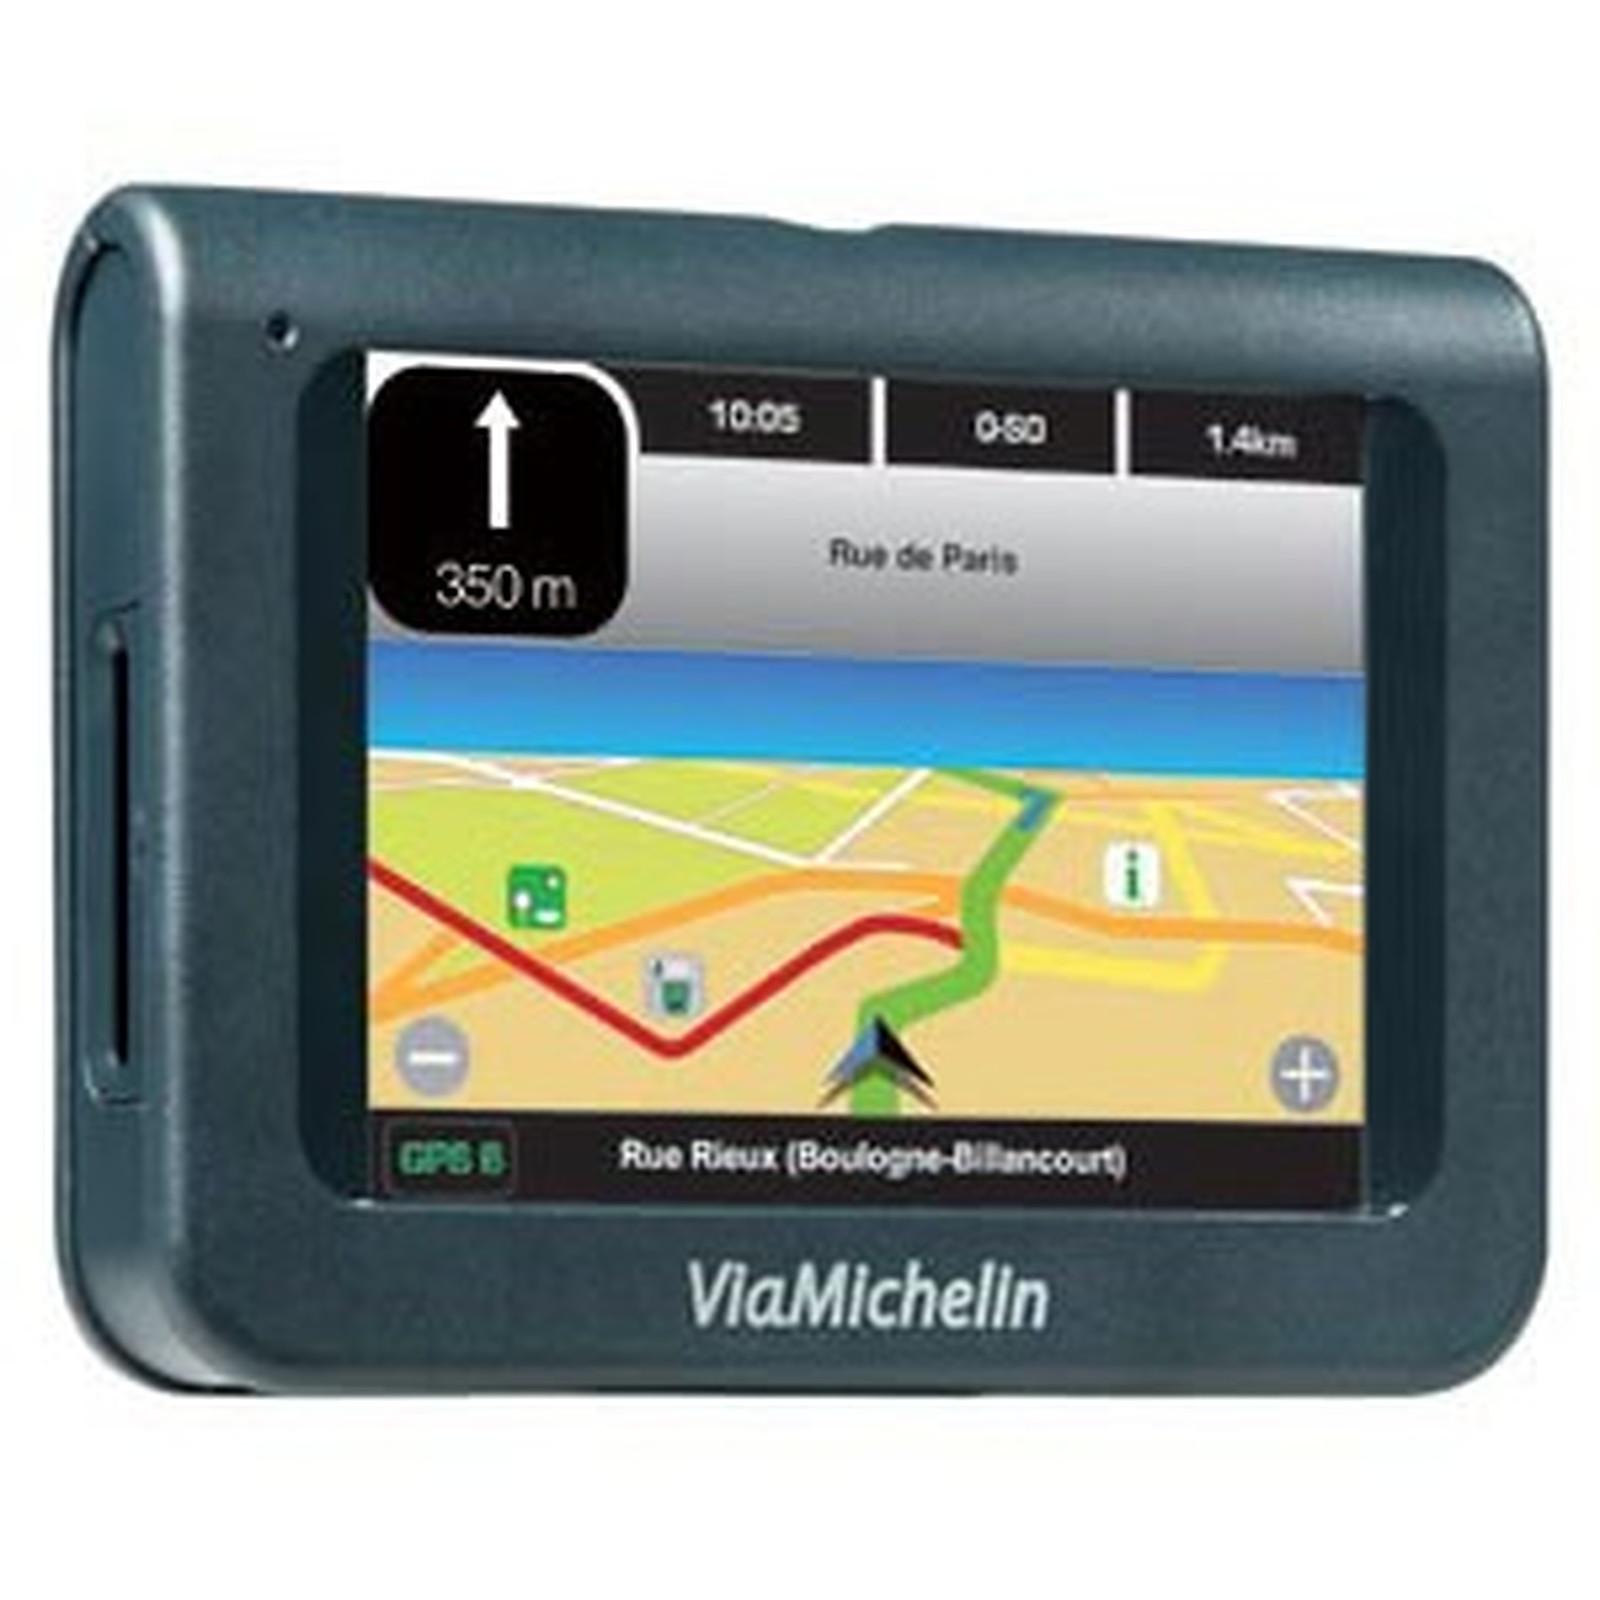 logiciel viamichelin navigation 5